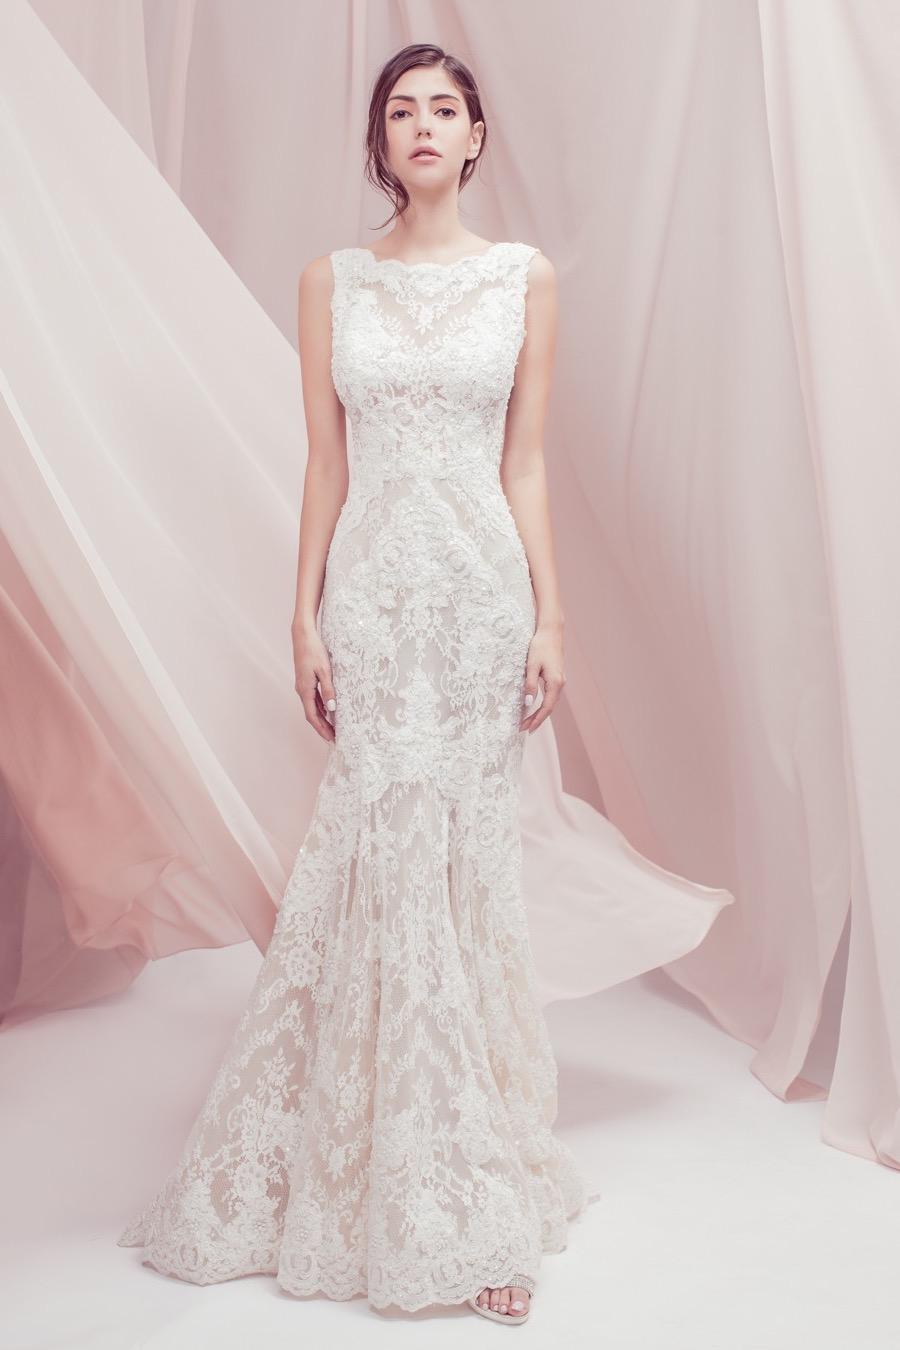 38436b14e57 Vintage Inspired Lace Wedding Dresses Uk - Gomes Weine AG